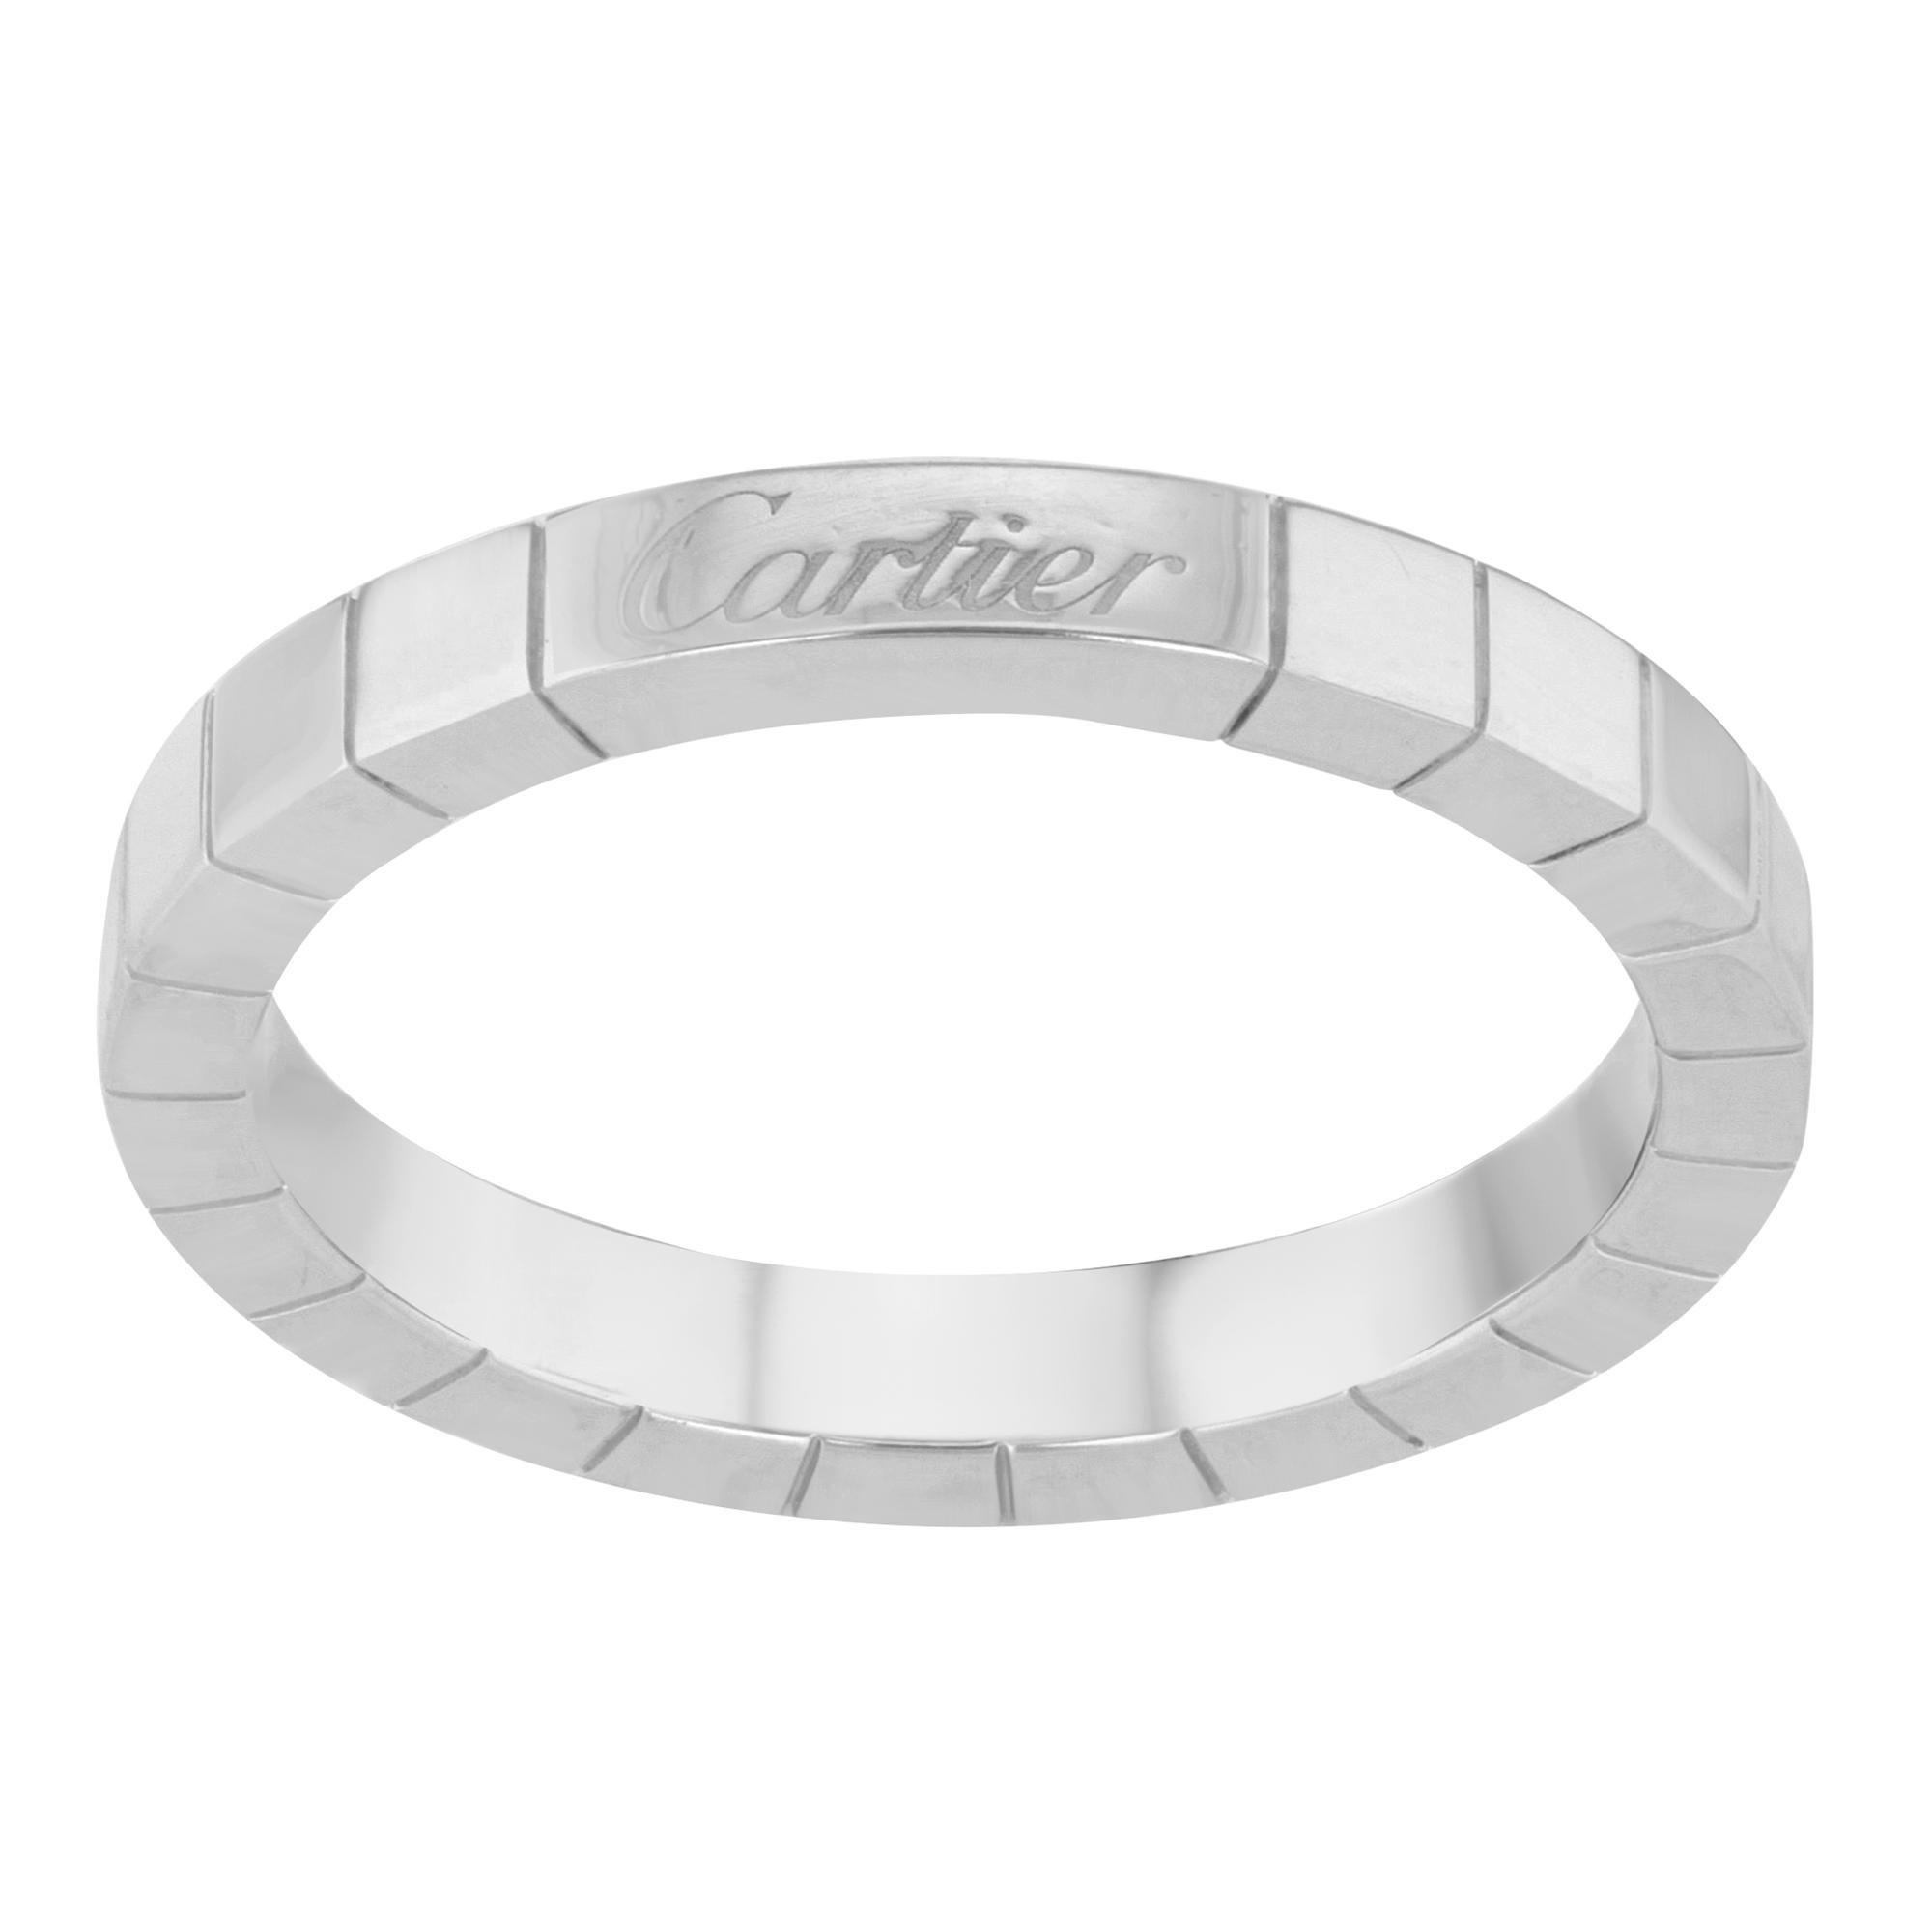 5c908524d64b2 Cartier Stella Diamond & 18k White Gold Wedding Band Ring Size 47